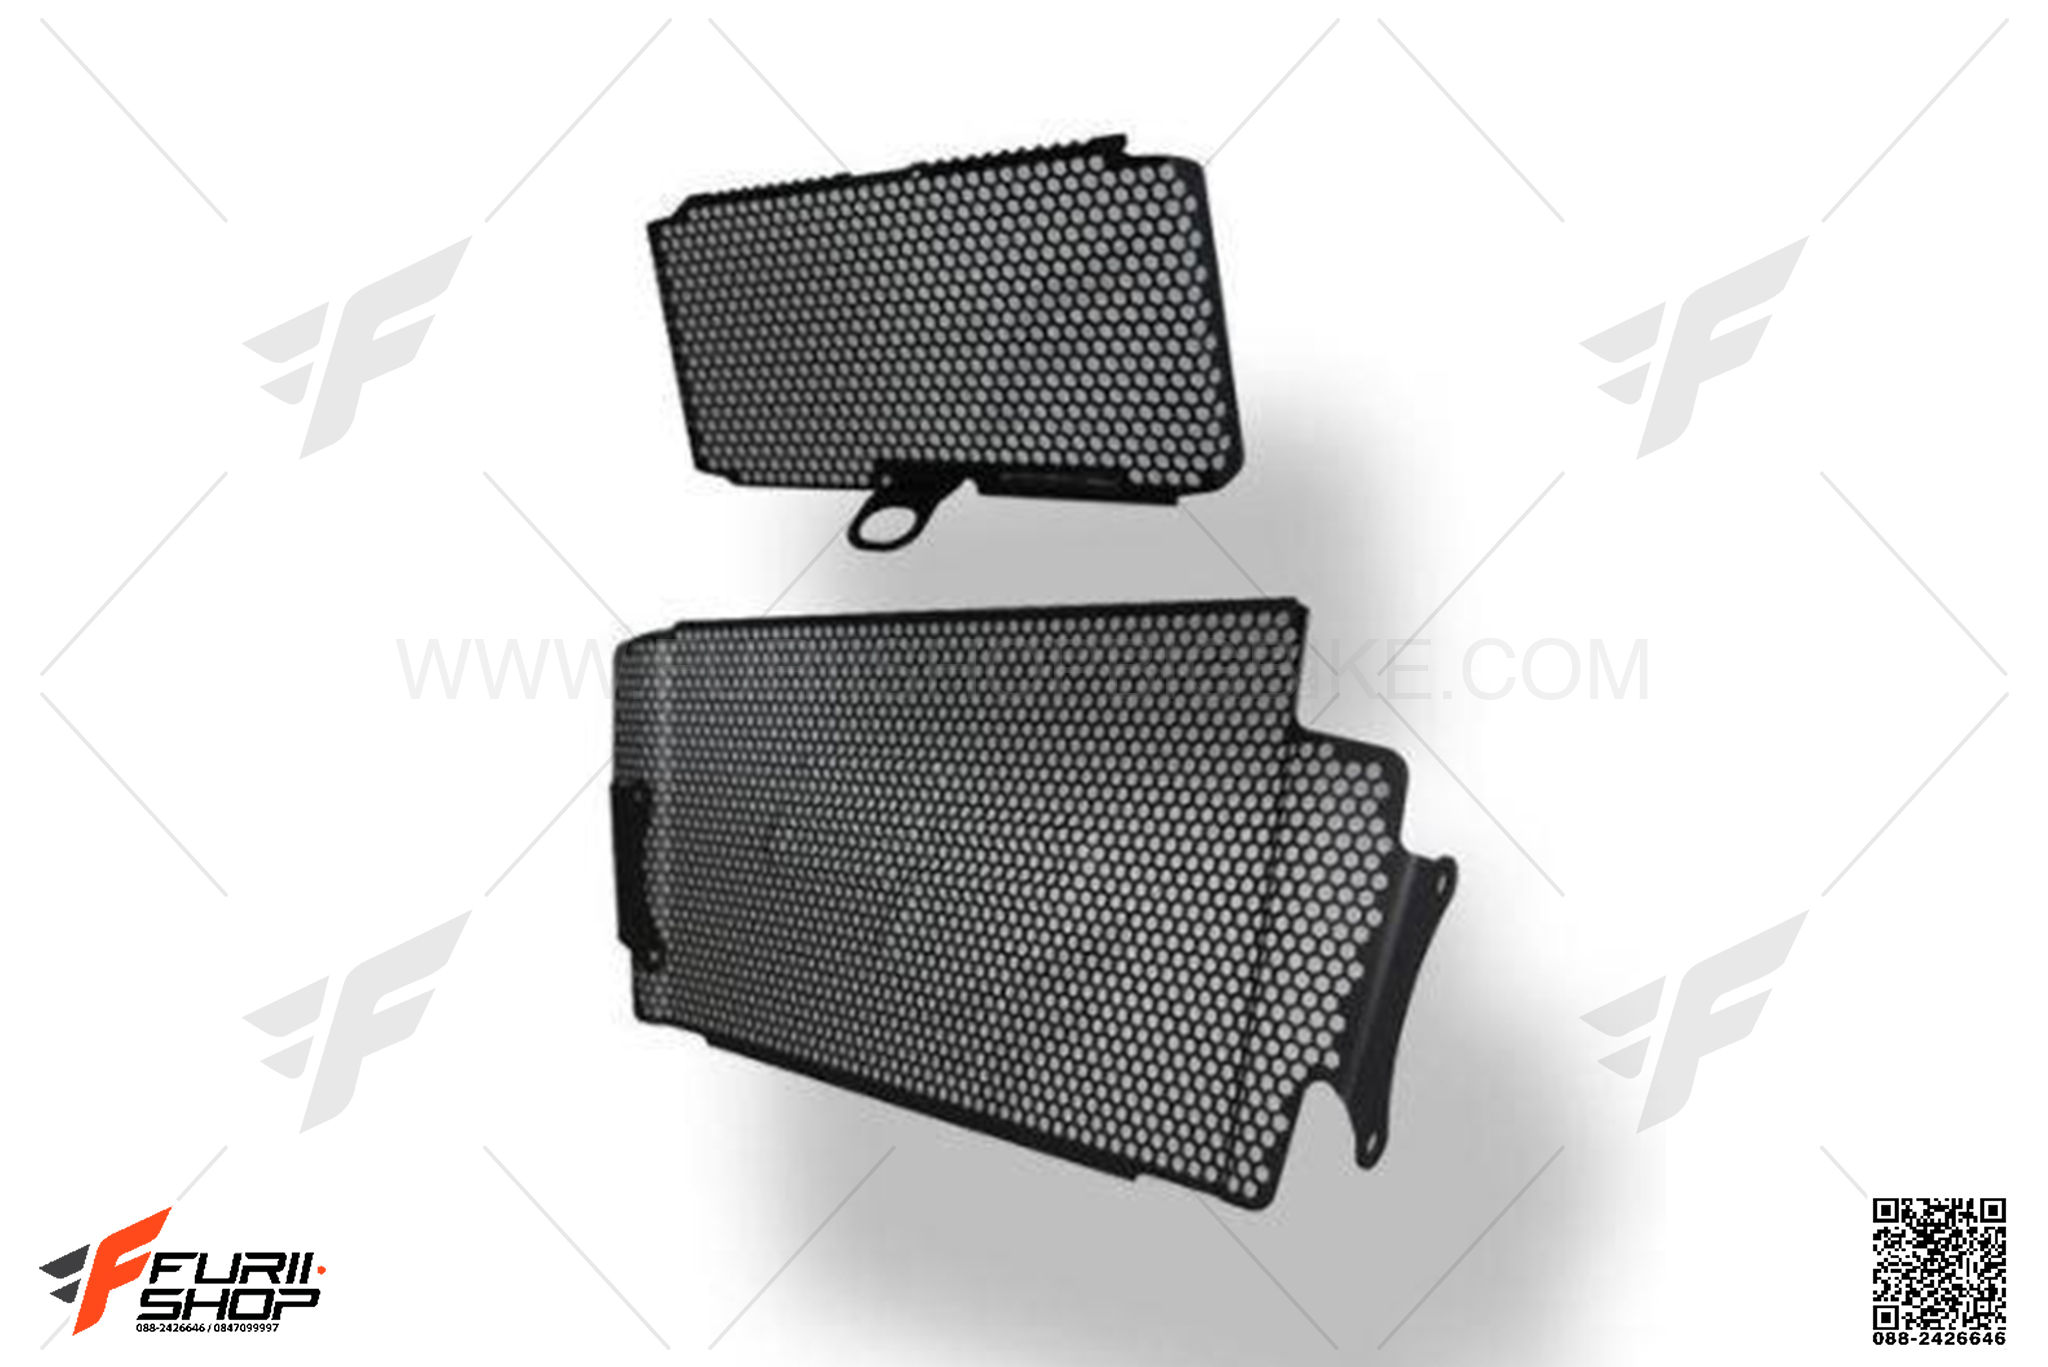 ducati scrambler sixty 2 2016-2017 Evotech Performance Headlight Guard grill